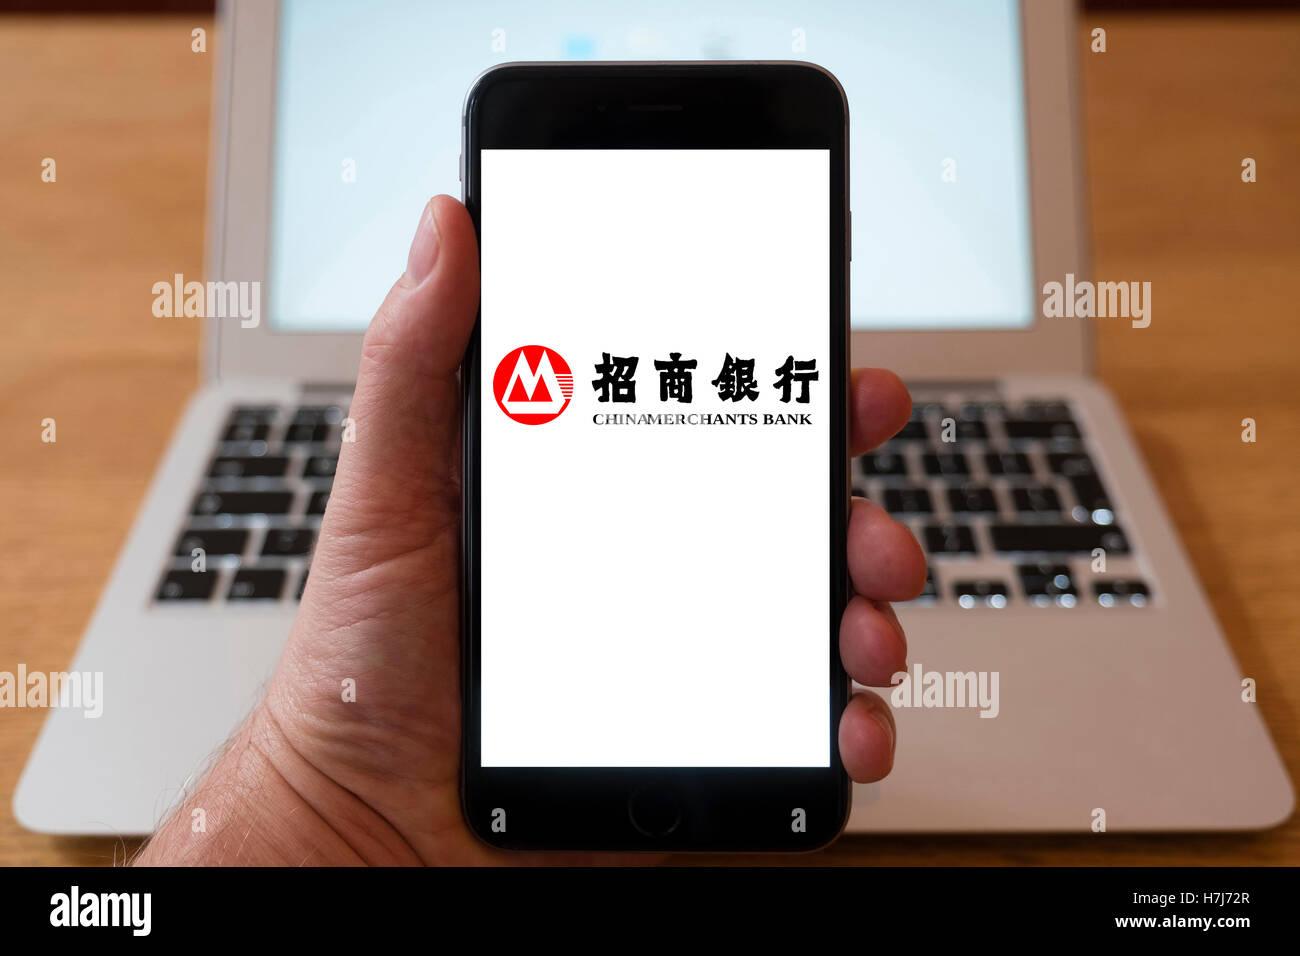 Using iPhone smartphone to display logo of China Merchants Bank - Stock Image